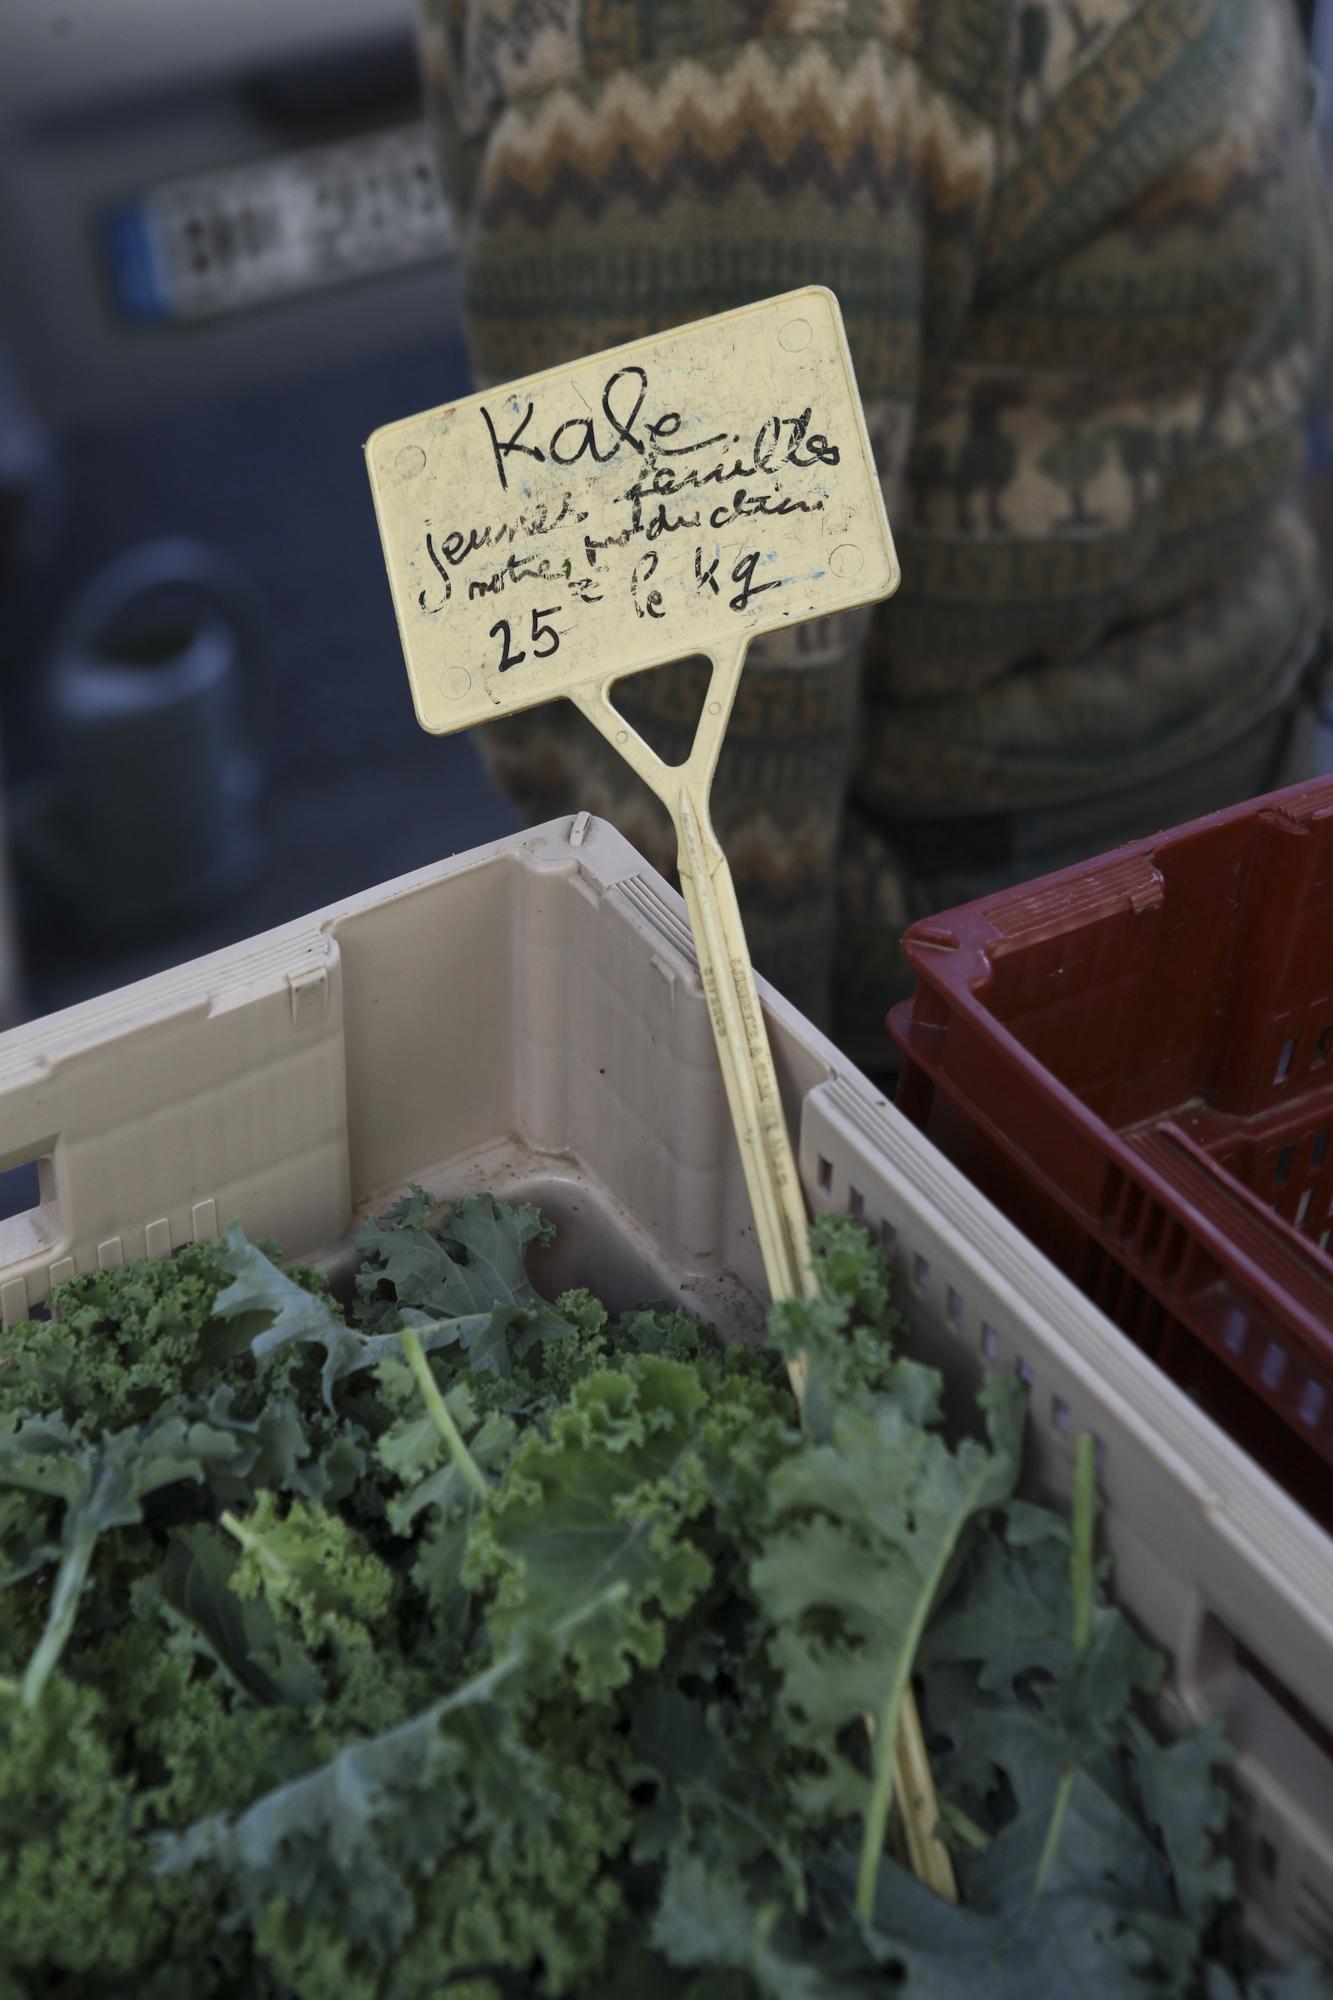 Raspail Organic Market. Hermione Boehrer's stall